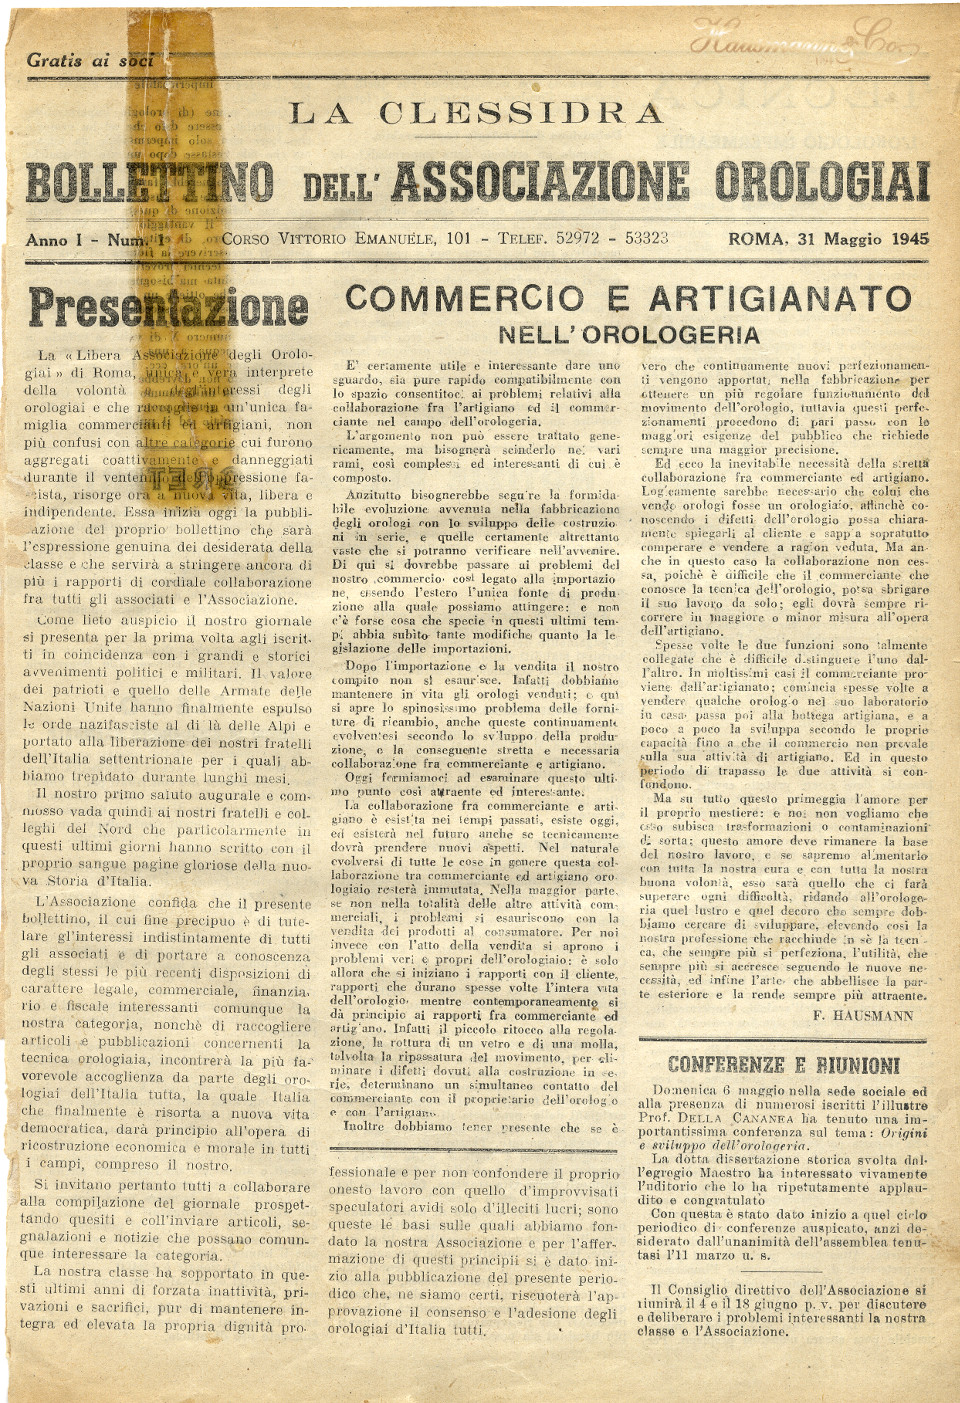 Articolo 1945 originale su orologi orologiai artigiani